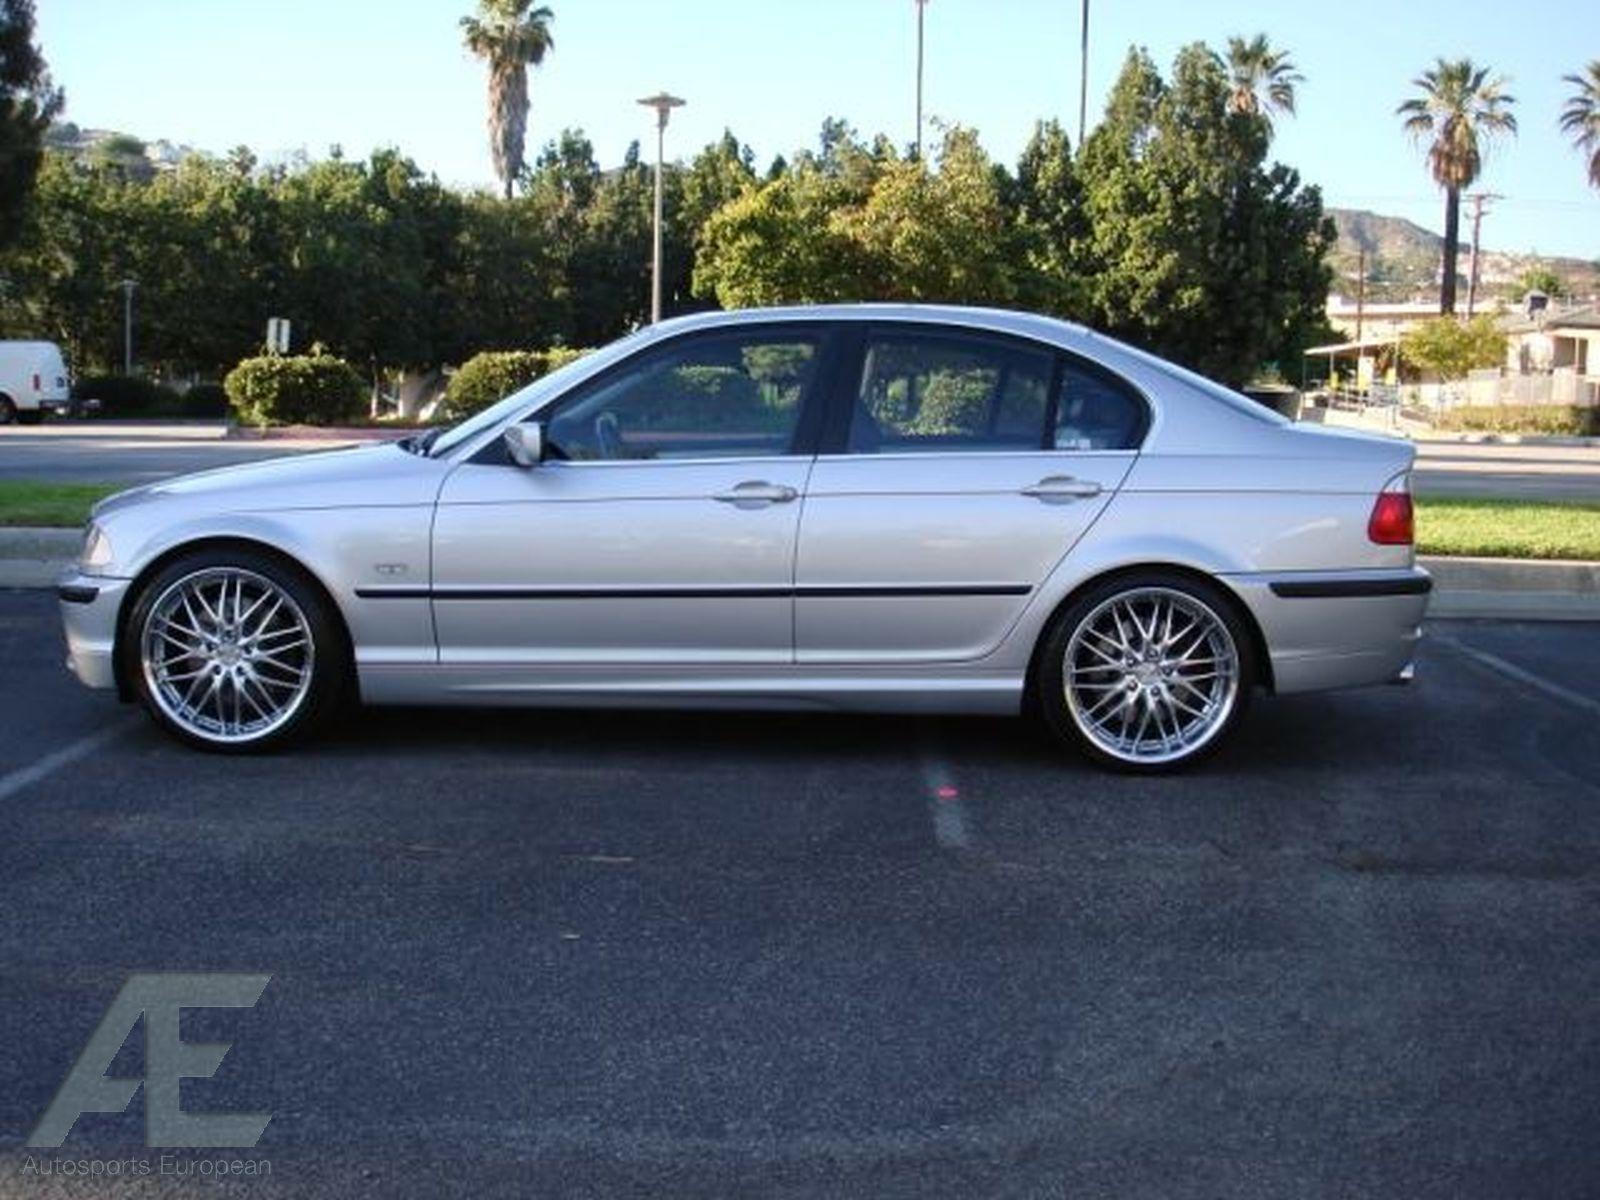 19 BMW Wheels Rims Tires 328i 330i E46 E36 M3 Z3 Z4 18